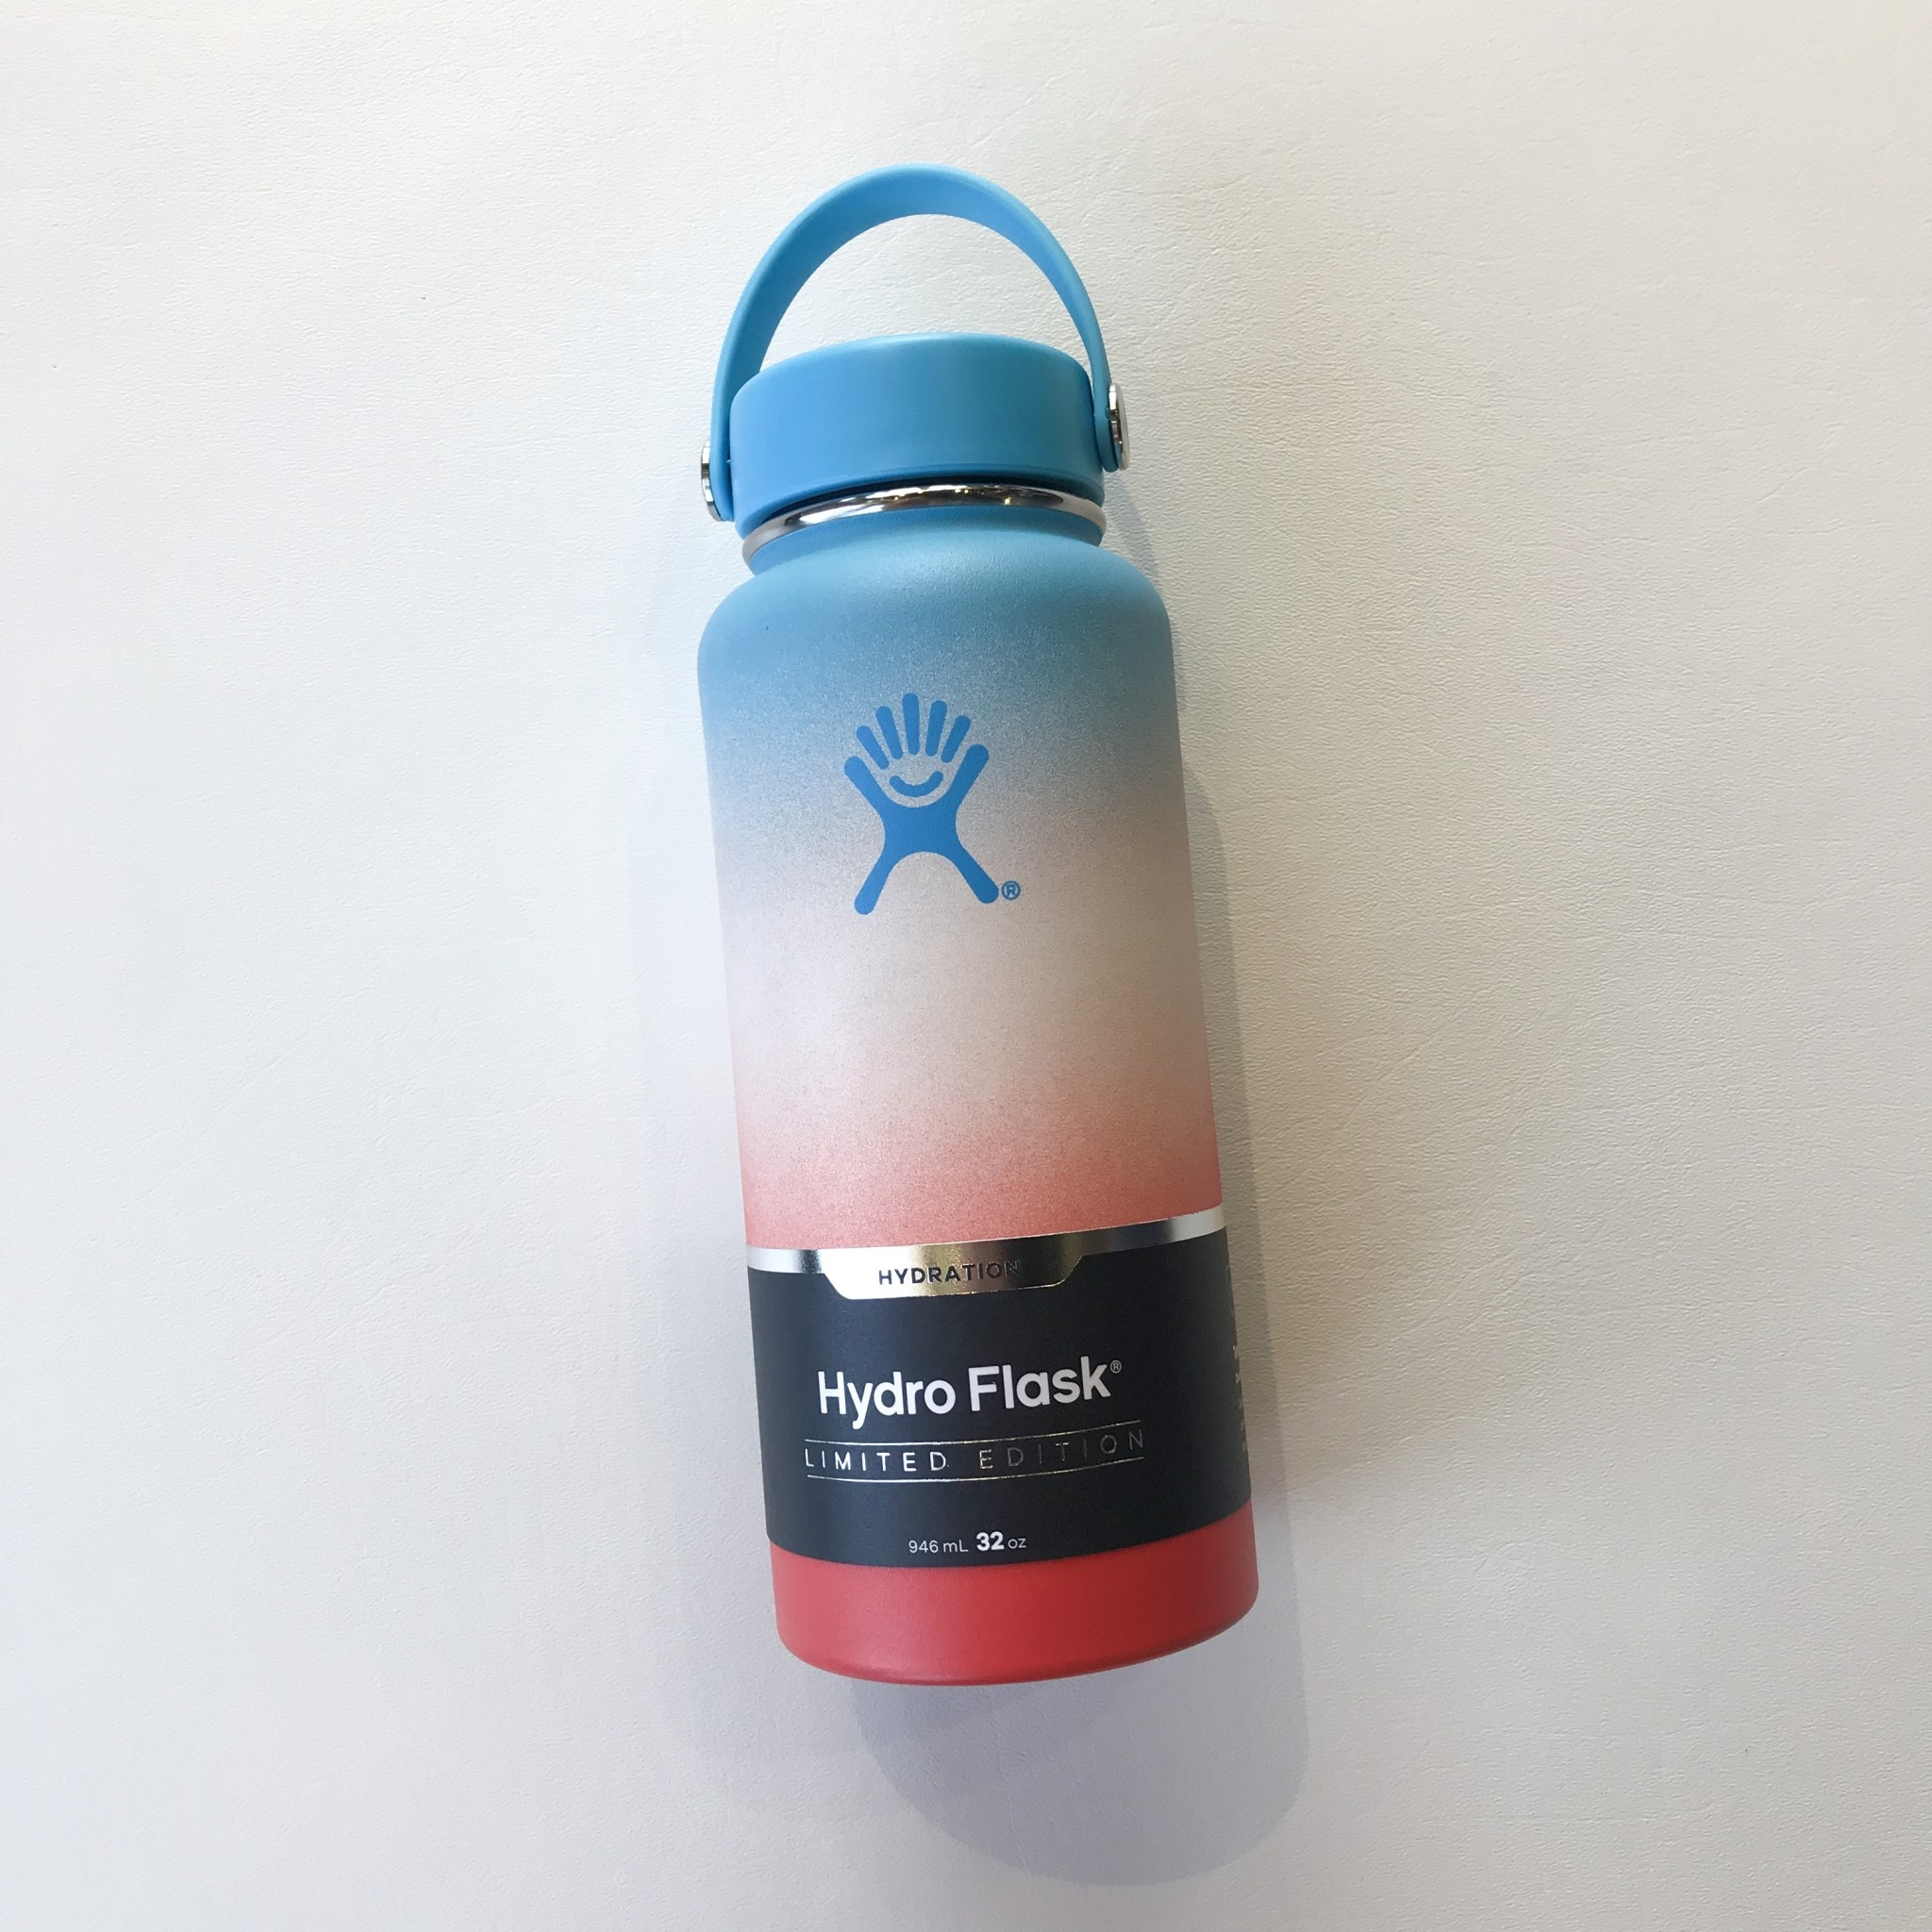 Hydro flask 32 oz keiki rainbow limited edition